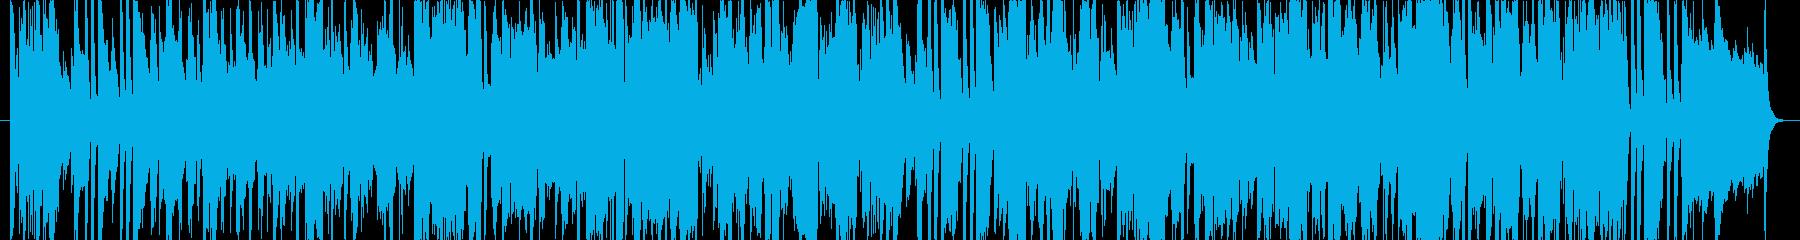 Jazz Pi Tr Ba Dr カルテの再生済みの波形